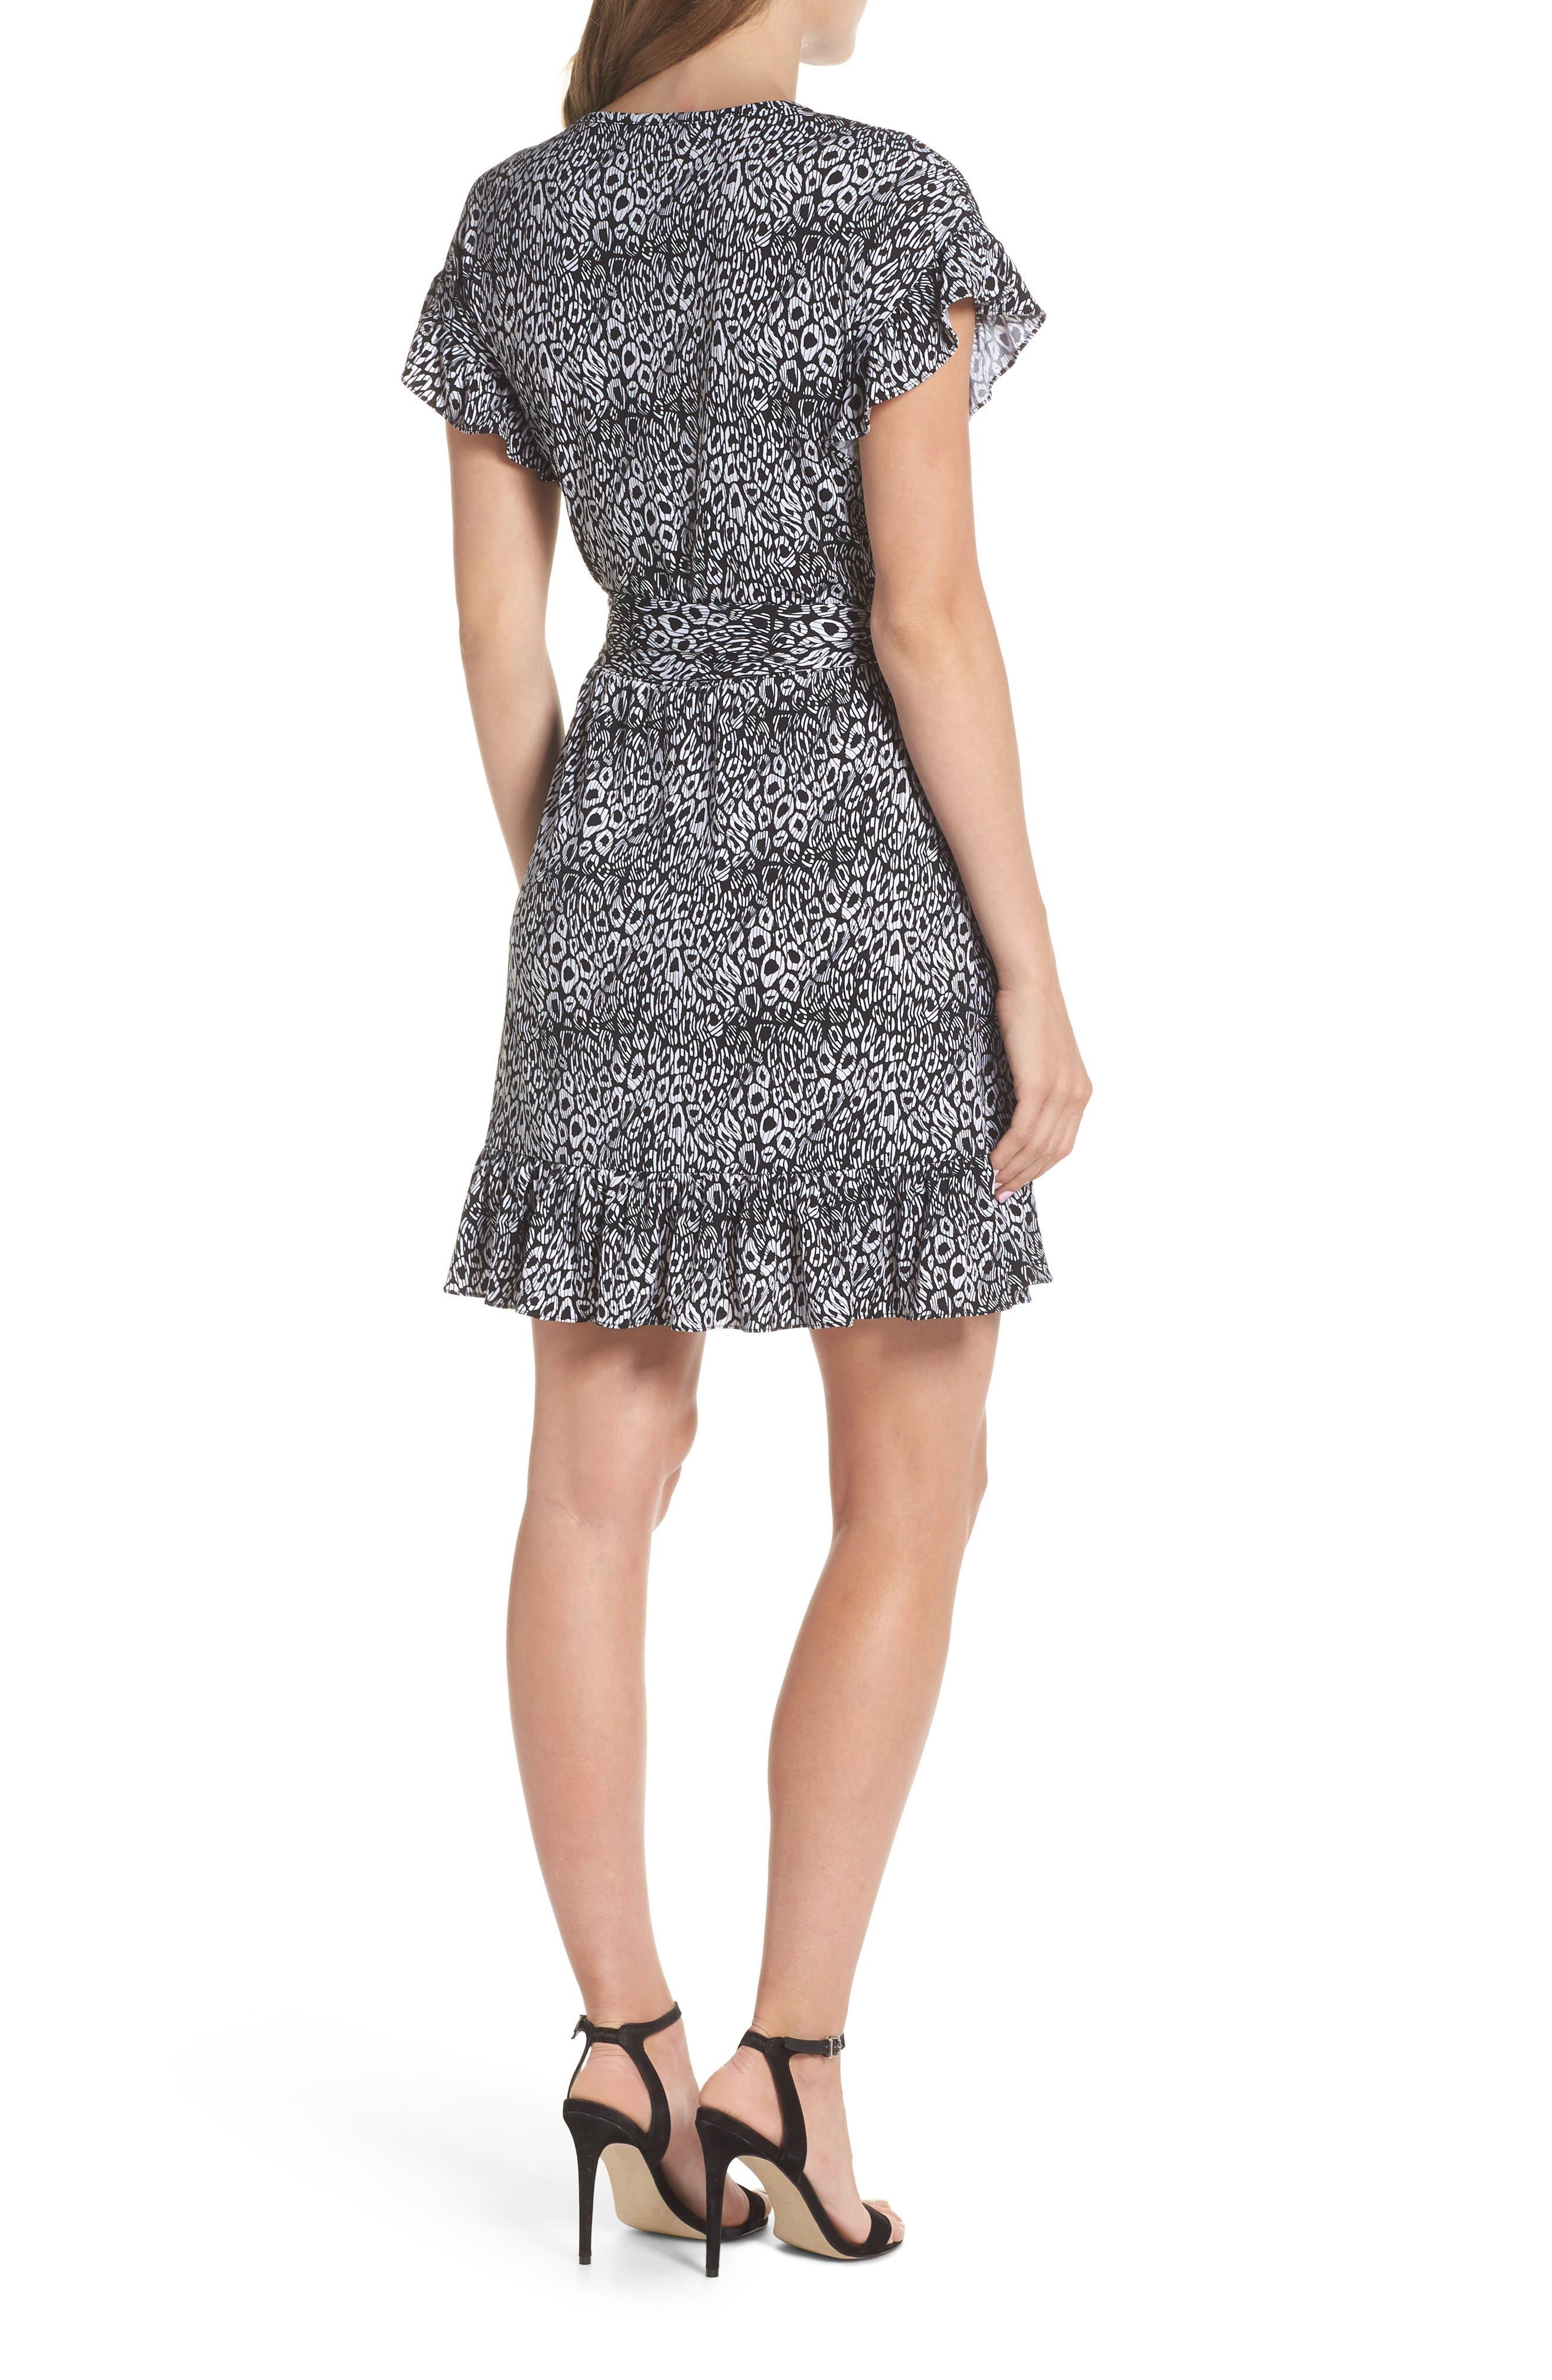 Wavy Leopard Print Ruffle Dress,                             Alternate thumbnail 2, color,                             Black/ White